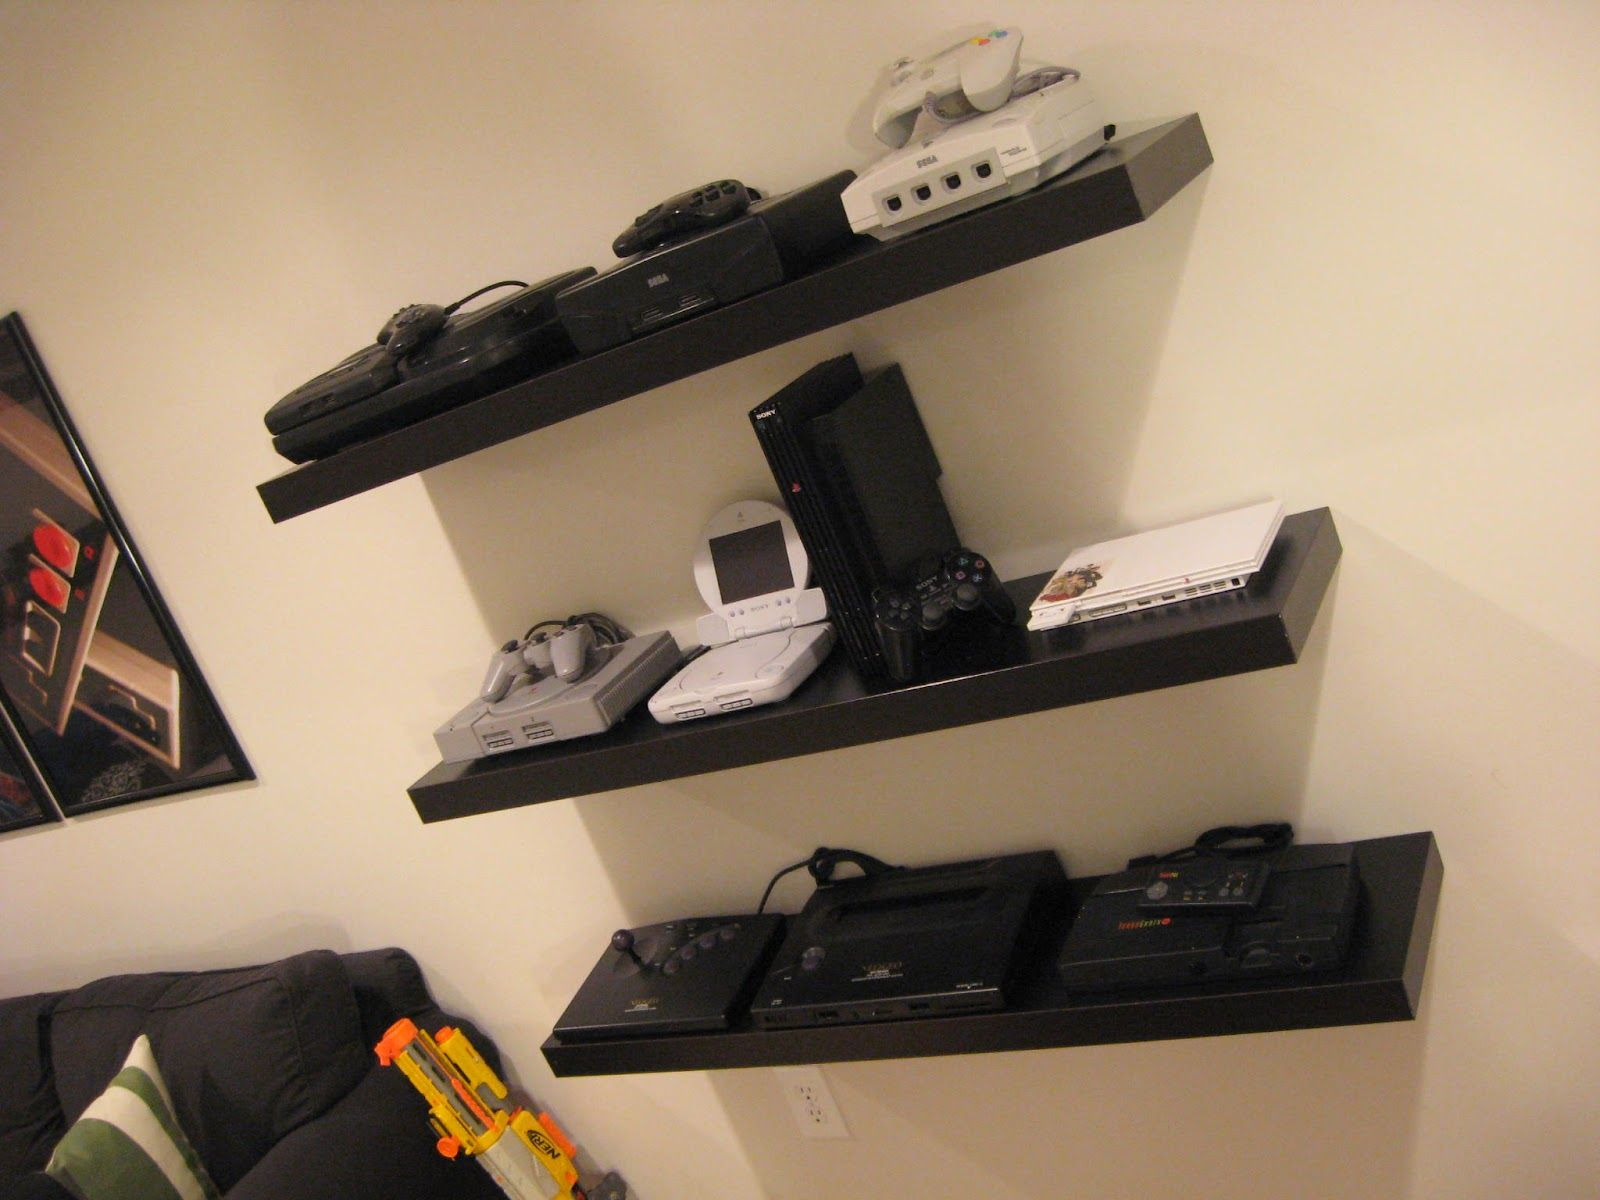 Floating Console Shelves Gaming Room Via Backward Compatible Video Game Blog Video Game Shelf Game Room Video Game Rooms